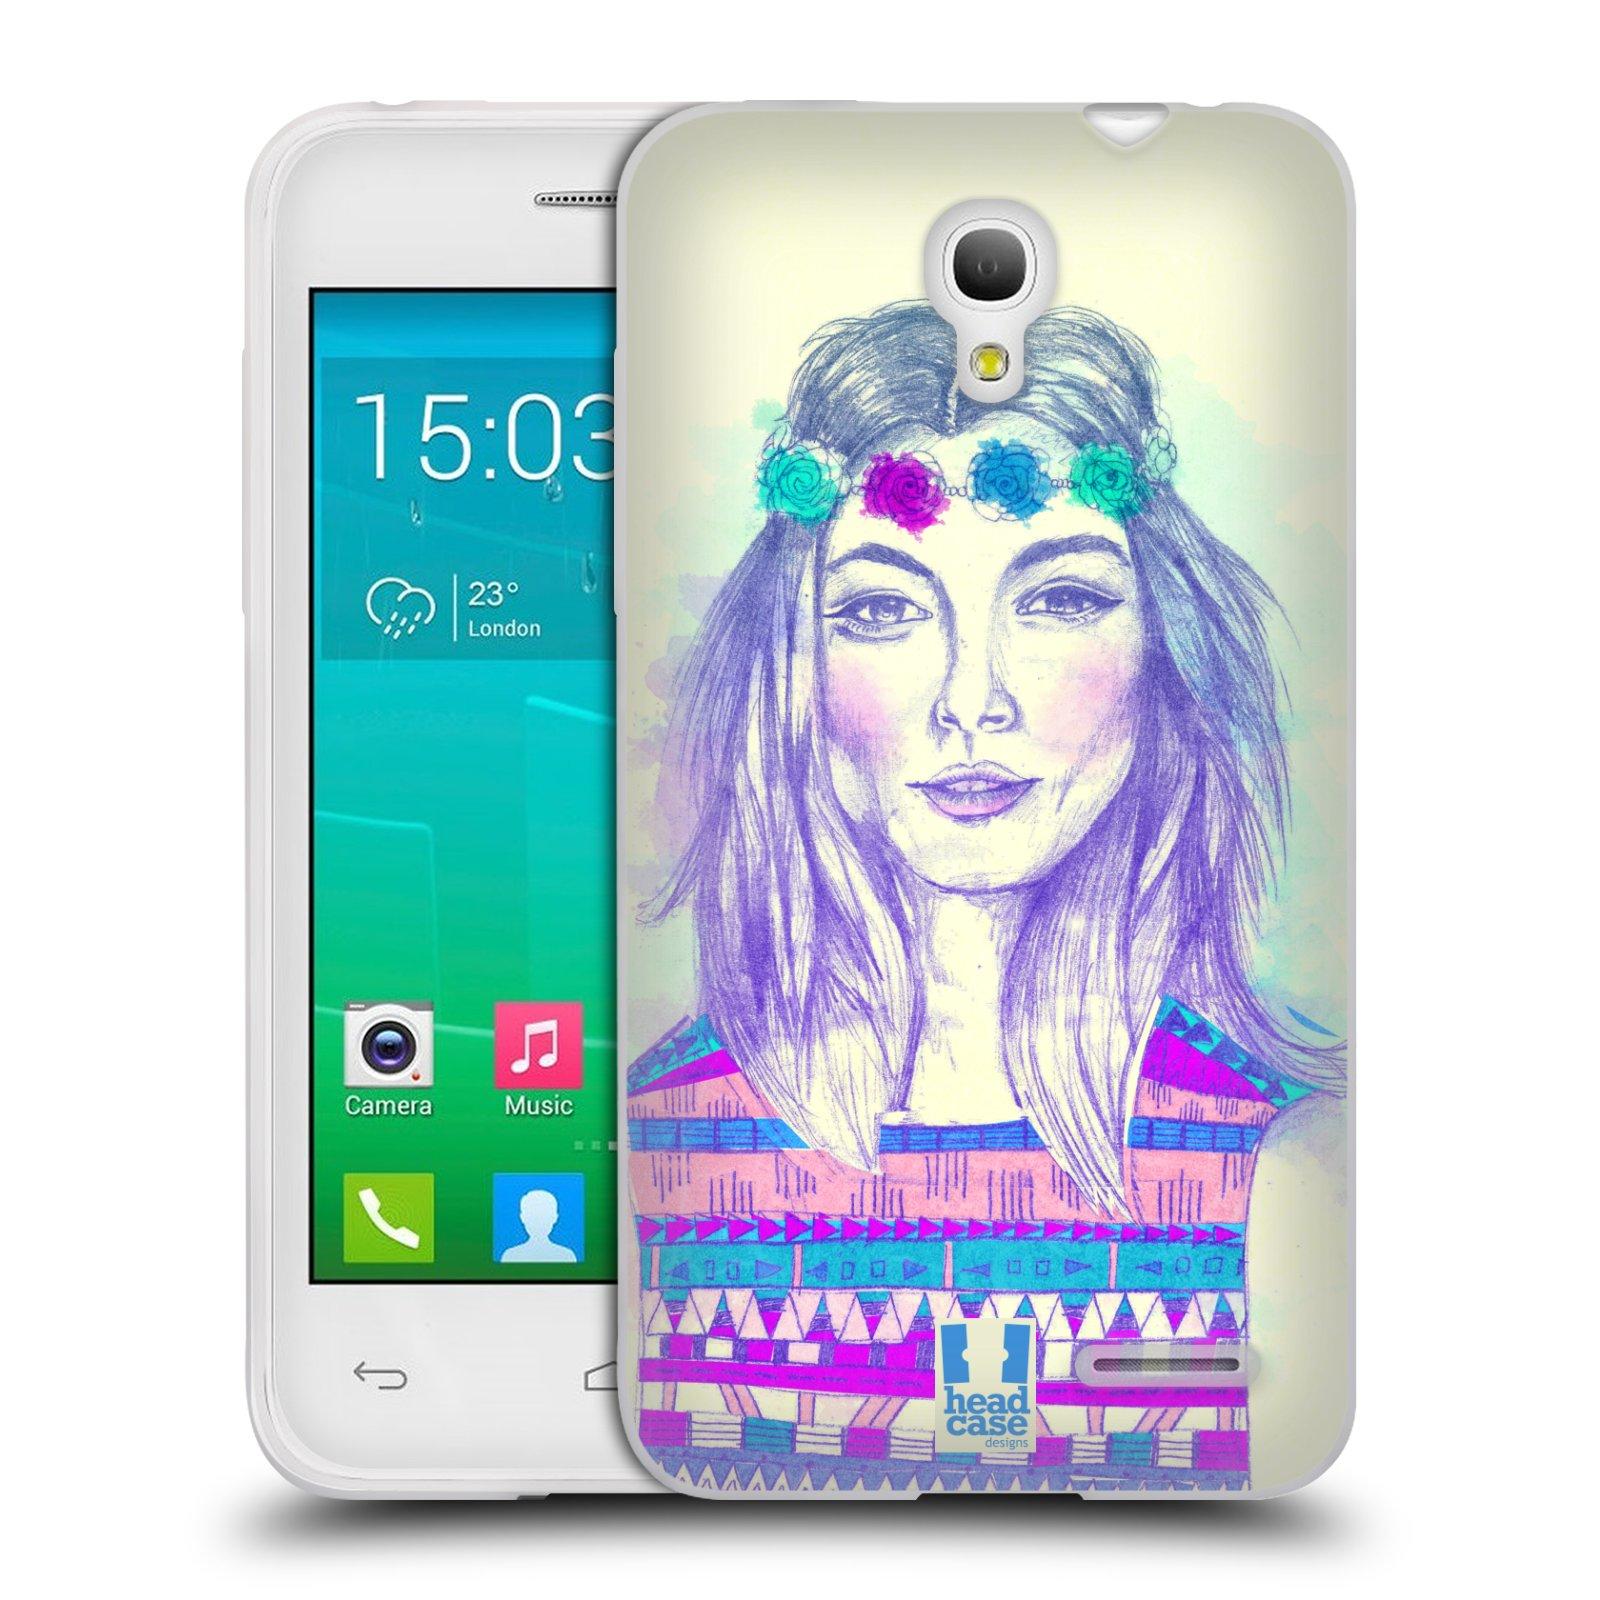 HEAD CASE silikonový obal na mobil Alcatel POP S3 OT-5050Y vzor Dívka dlouhé květinové vlasy HIPPIE modrá